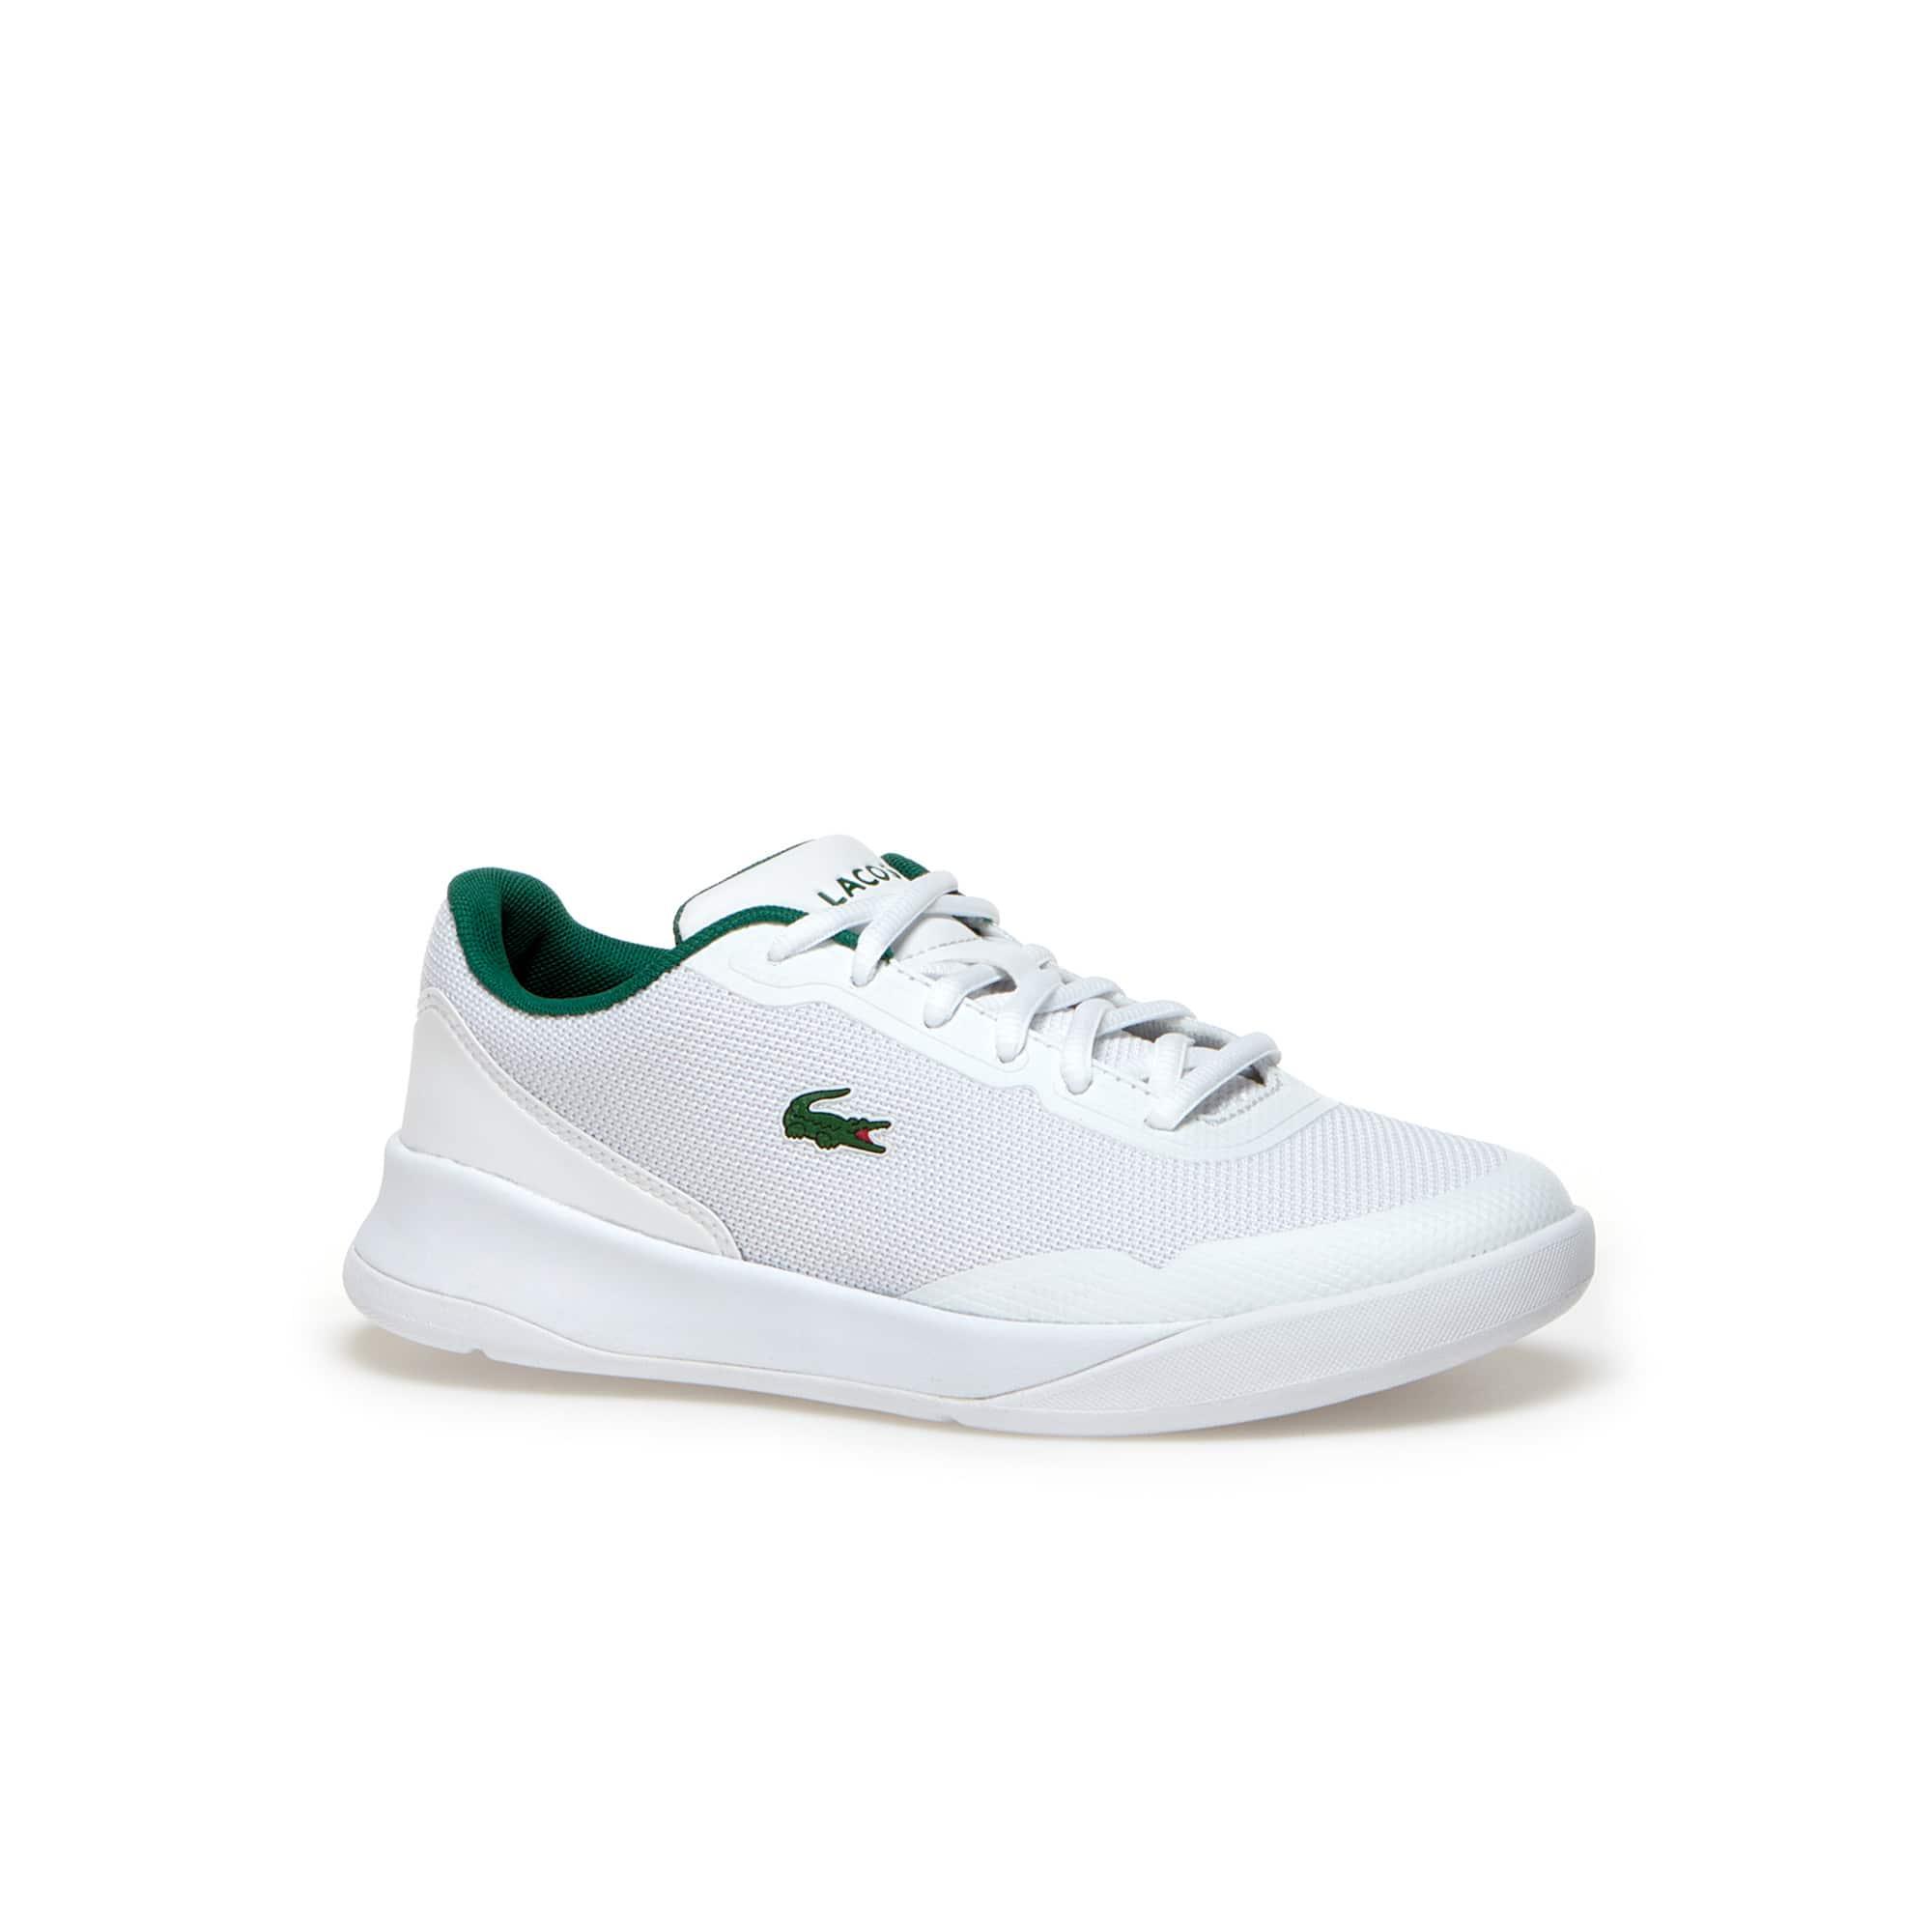 Women's LT Spirit Piqué Canvas Sneakers